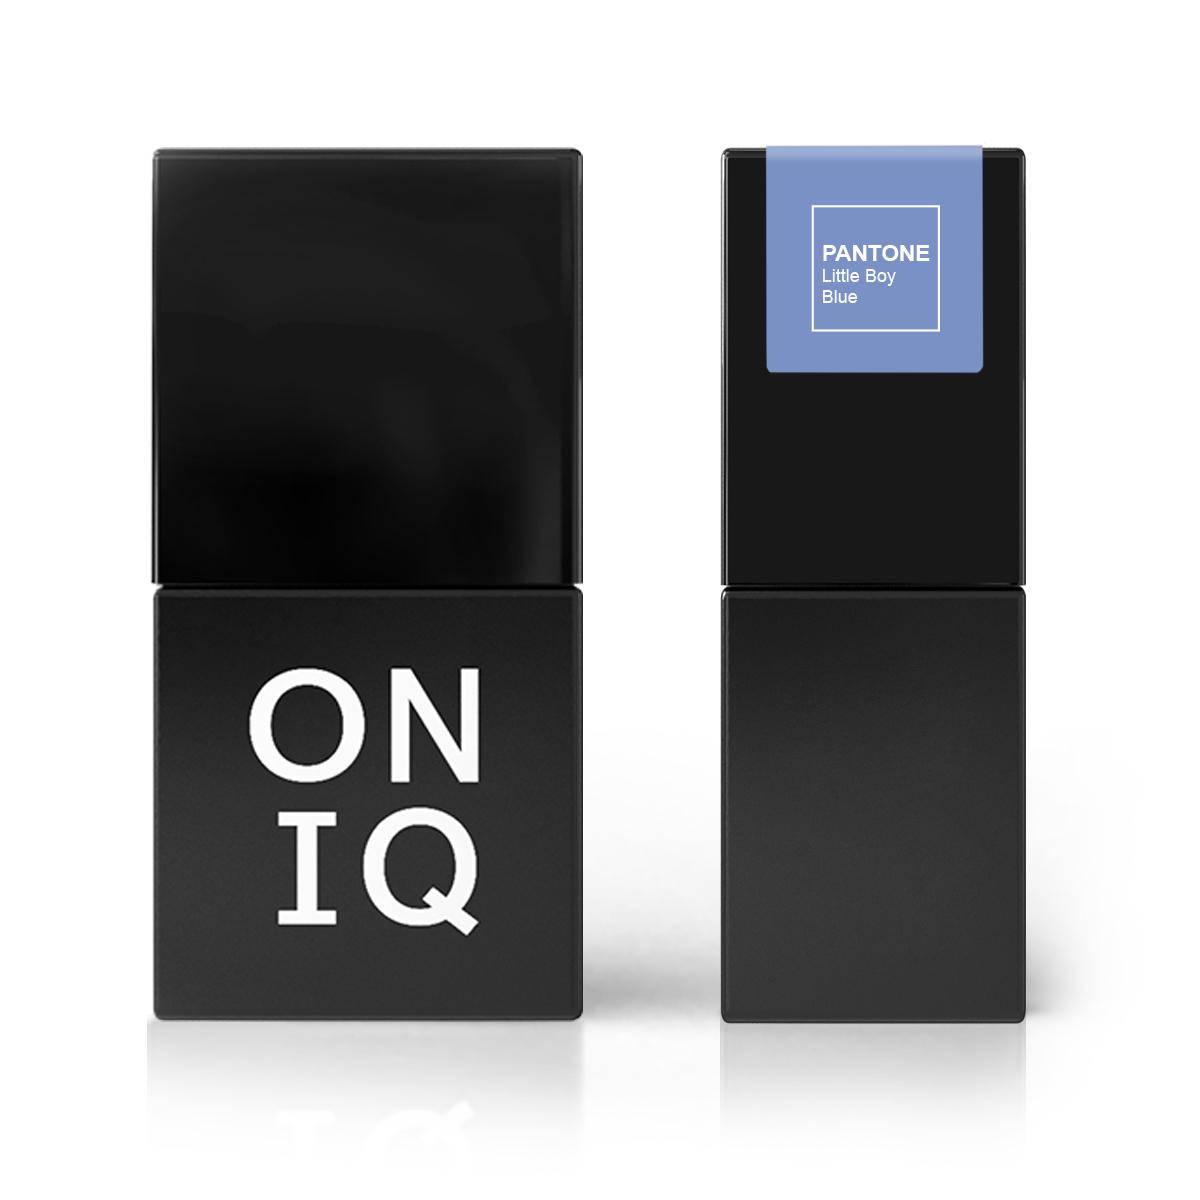 Oniq гель-лак для покрытия ногтей, pantone: little boy blue, 10 мл